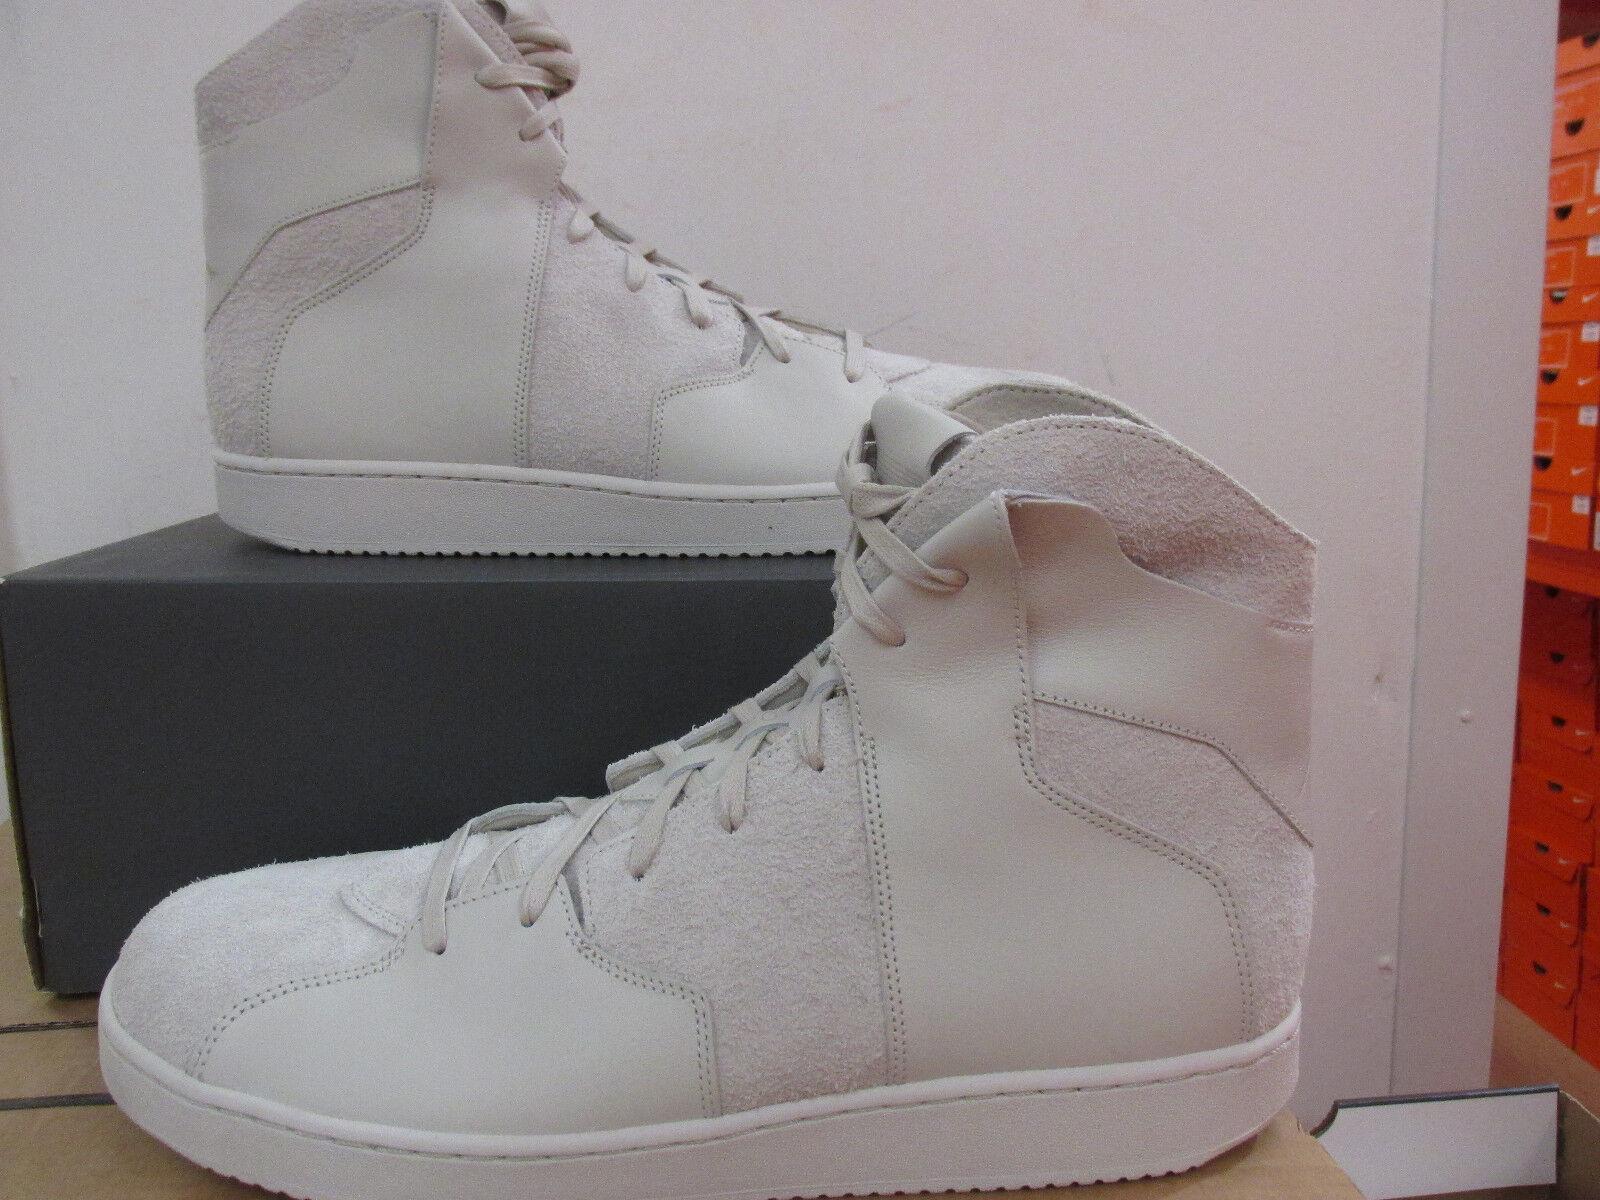 Nike Baskets Jordan Westbrook 0.2 Hommes Baskets Nike Montantes 854563 002 Enlèvement c5dfc3